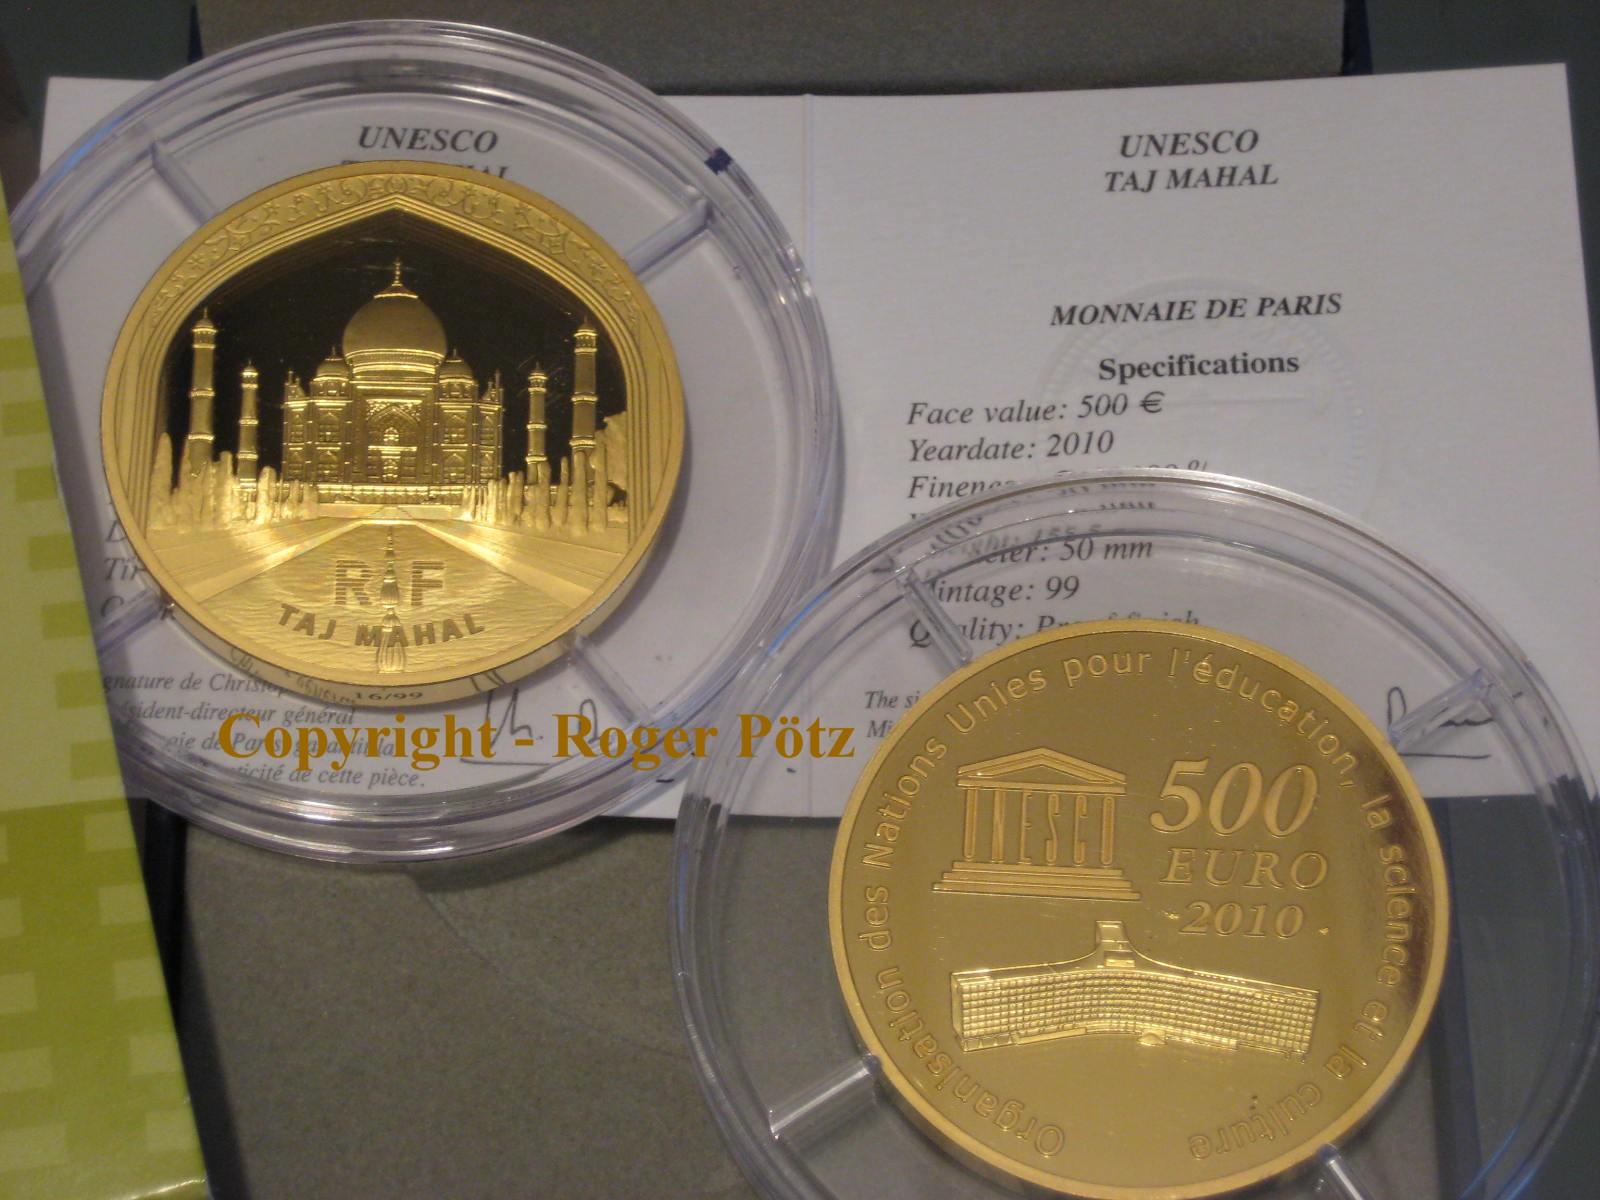 500 Euro 2010 Frankreich 500 Euro 2010 5 Unzen Fein Gold Taj Mahal UNESCO Serie nur 99 Ex. Auflage PP ( proof )